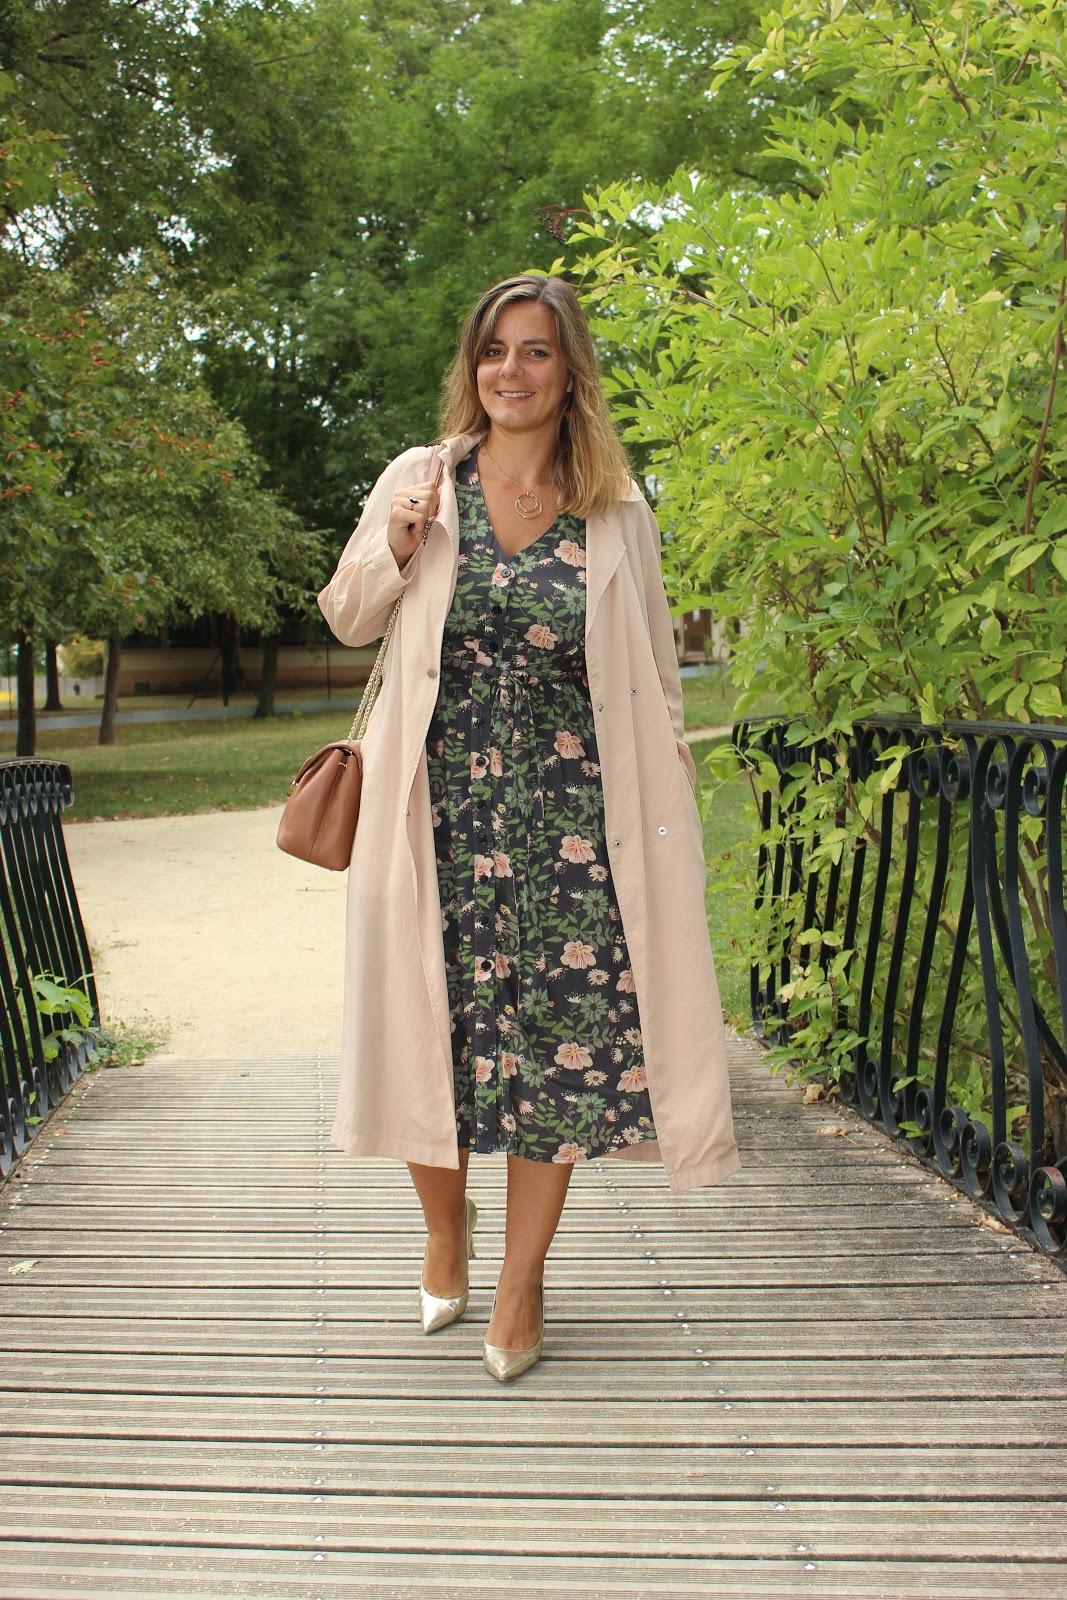 robe balzac, sac lancaster, sac polène, look du jour, mode, les petites bulles de ma vie